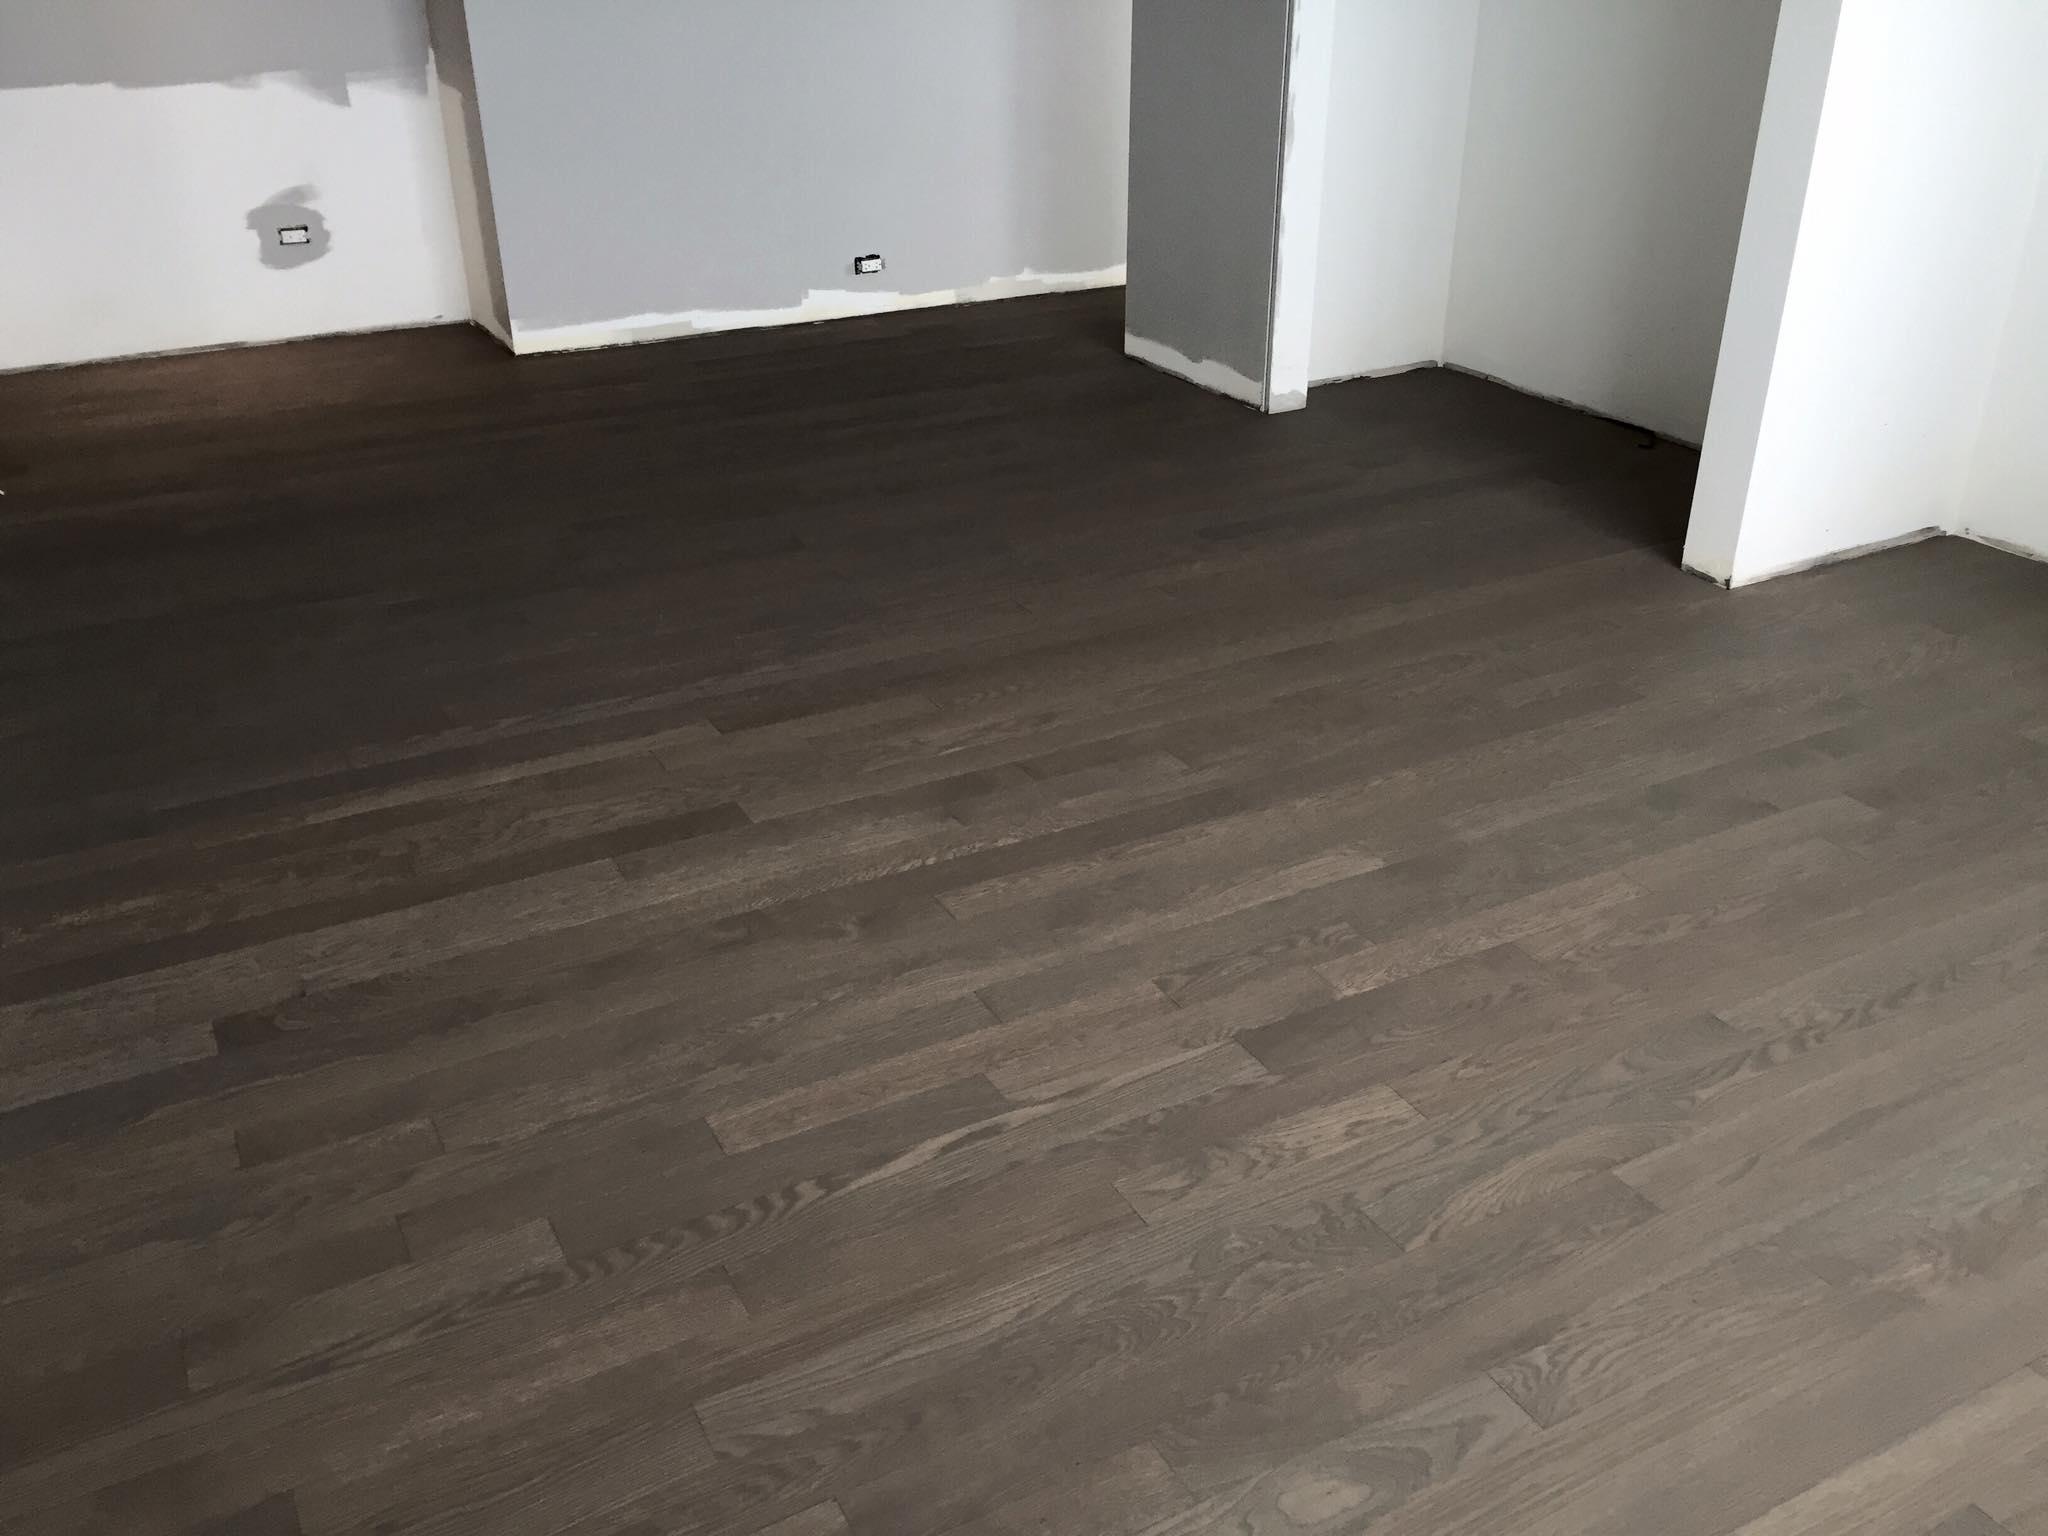 Chicago hardwood floor rubio monocoat install sanding for Flooring chicago